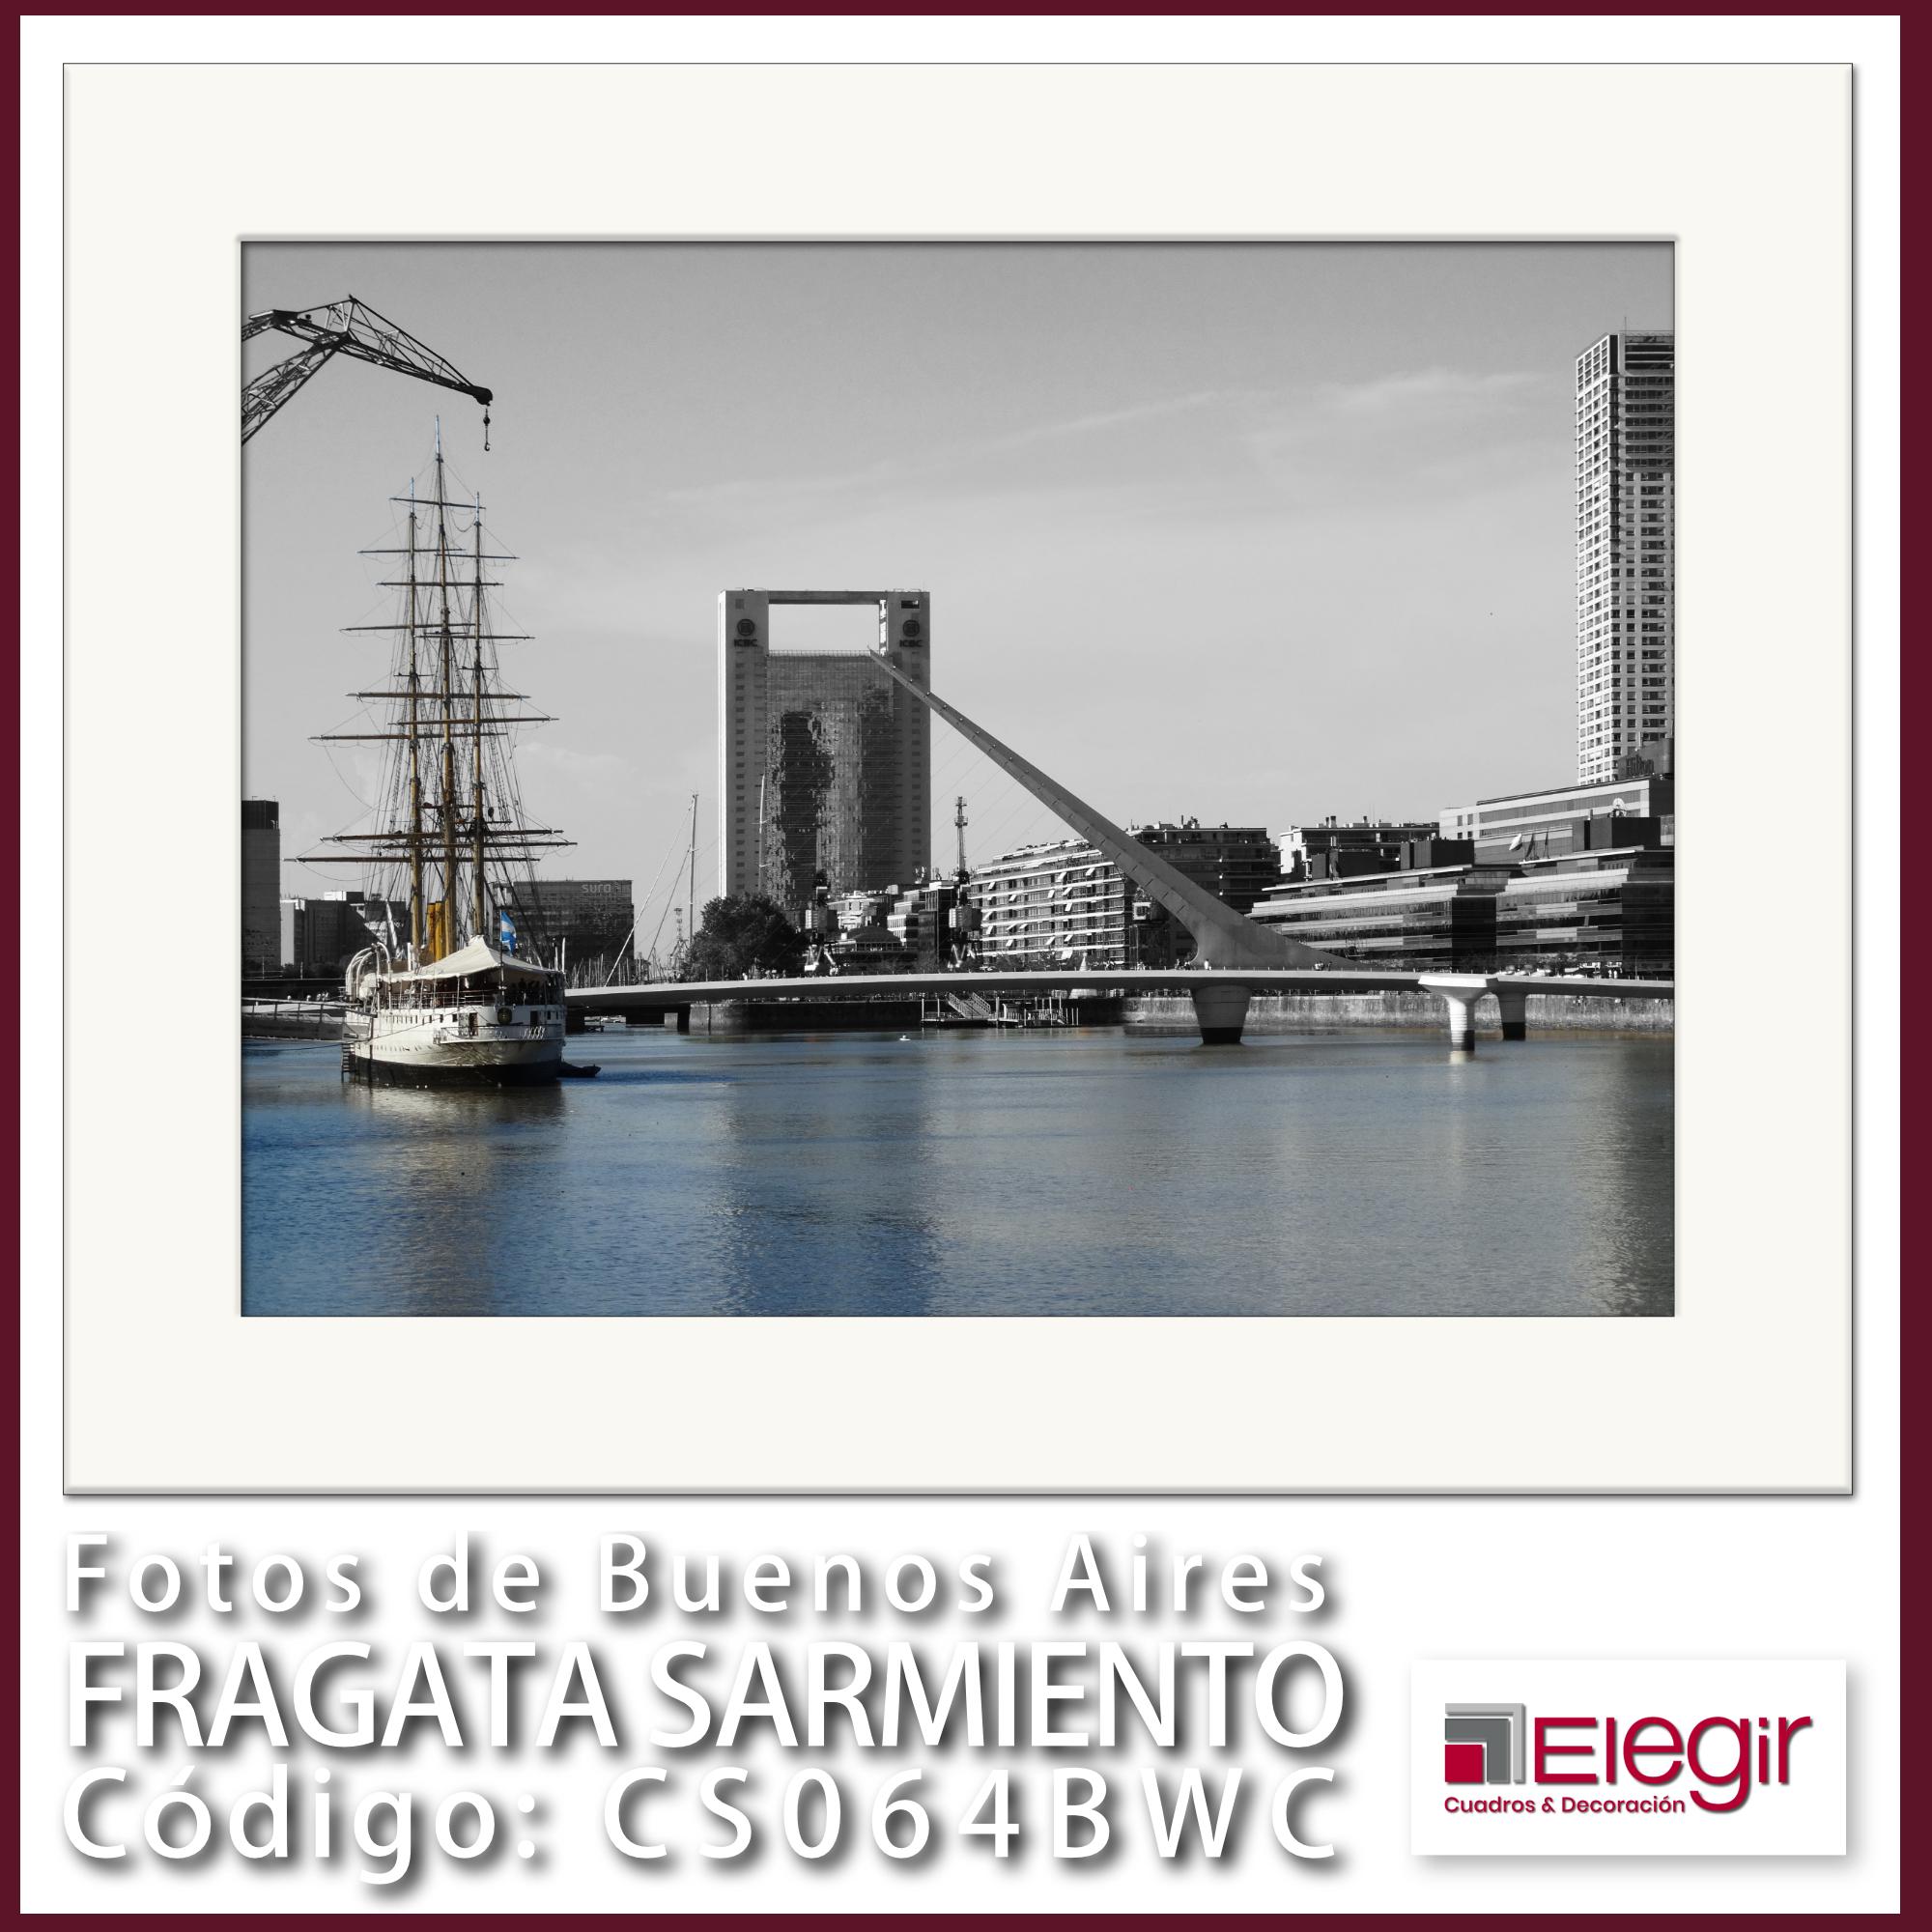 B CS064BWC Fragata Sarmiento 30x40